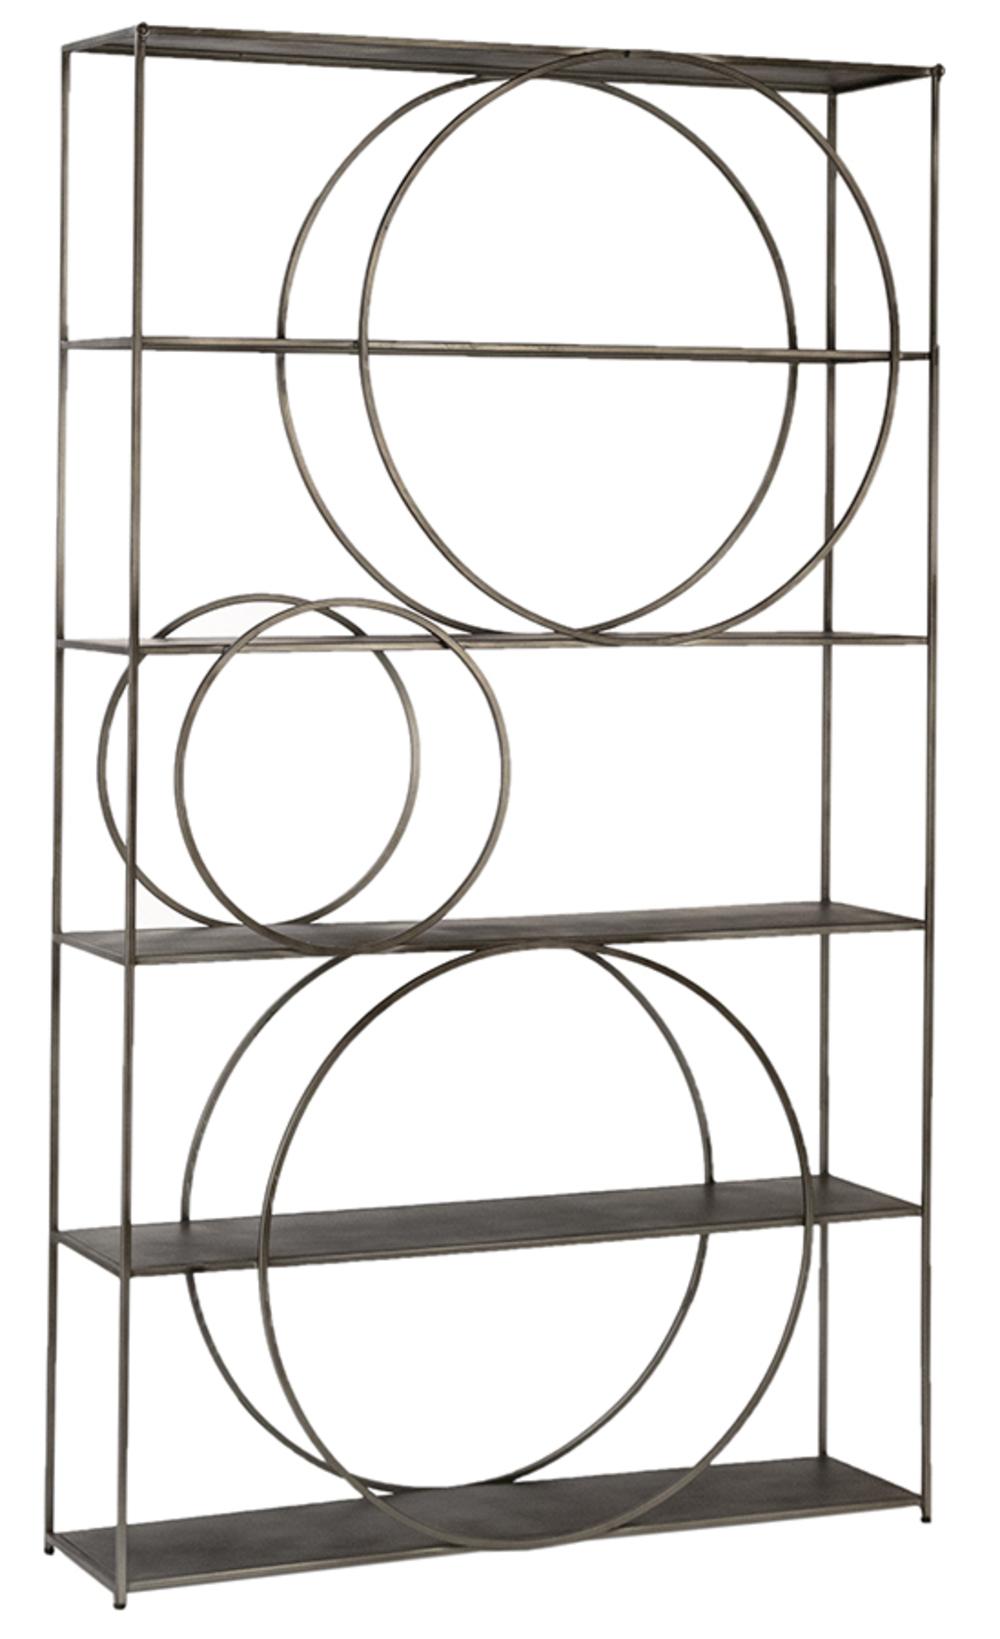 Dovetail Furniture - Kukk Bookcase